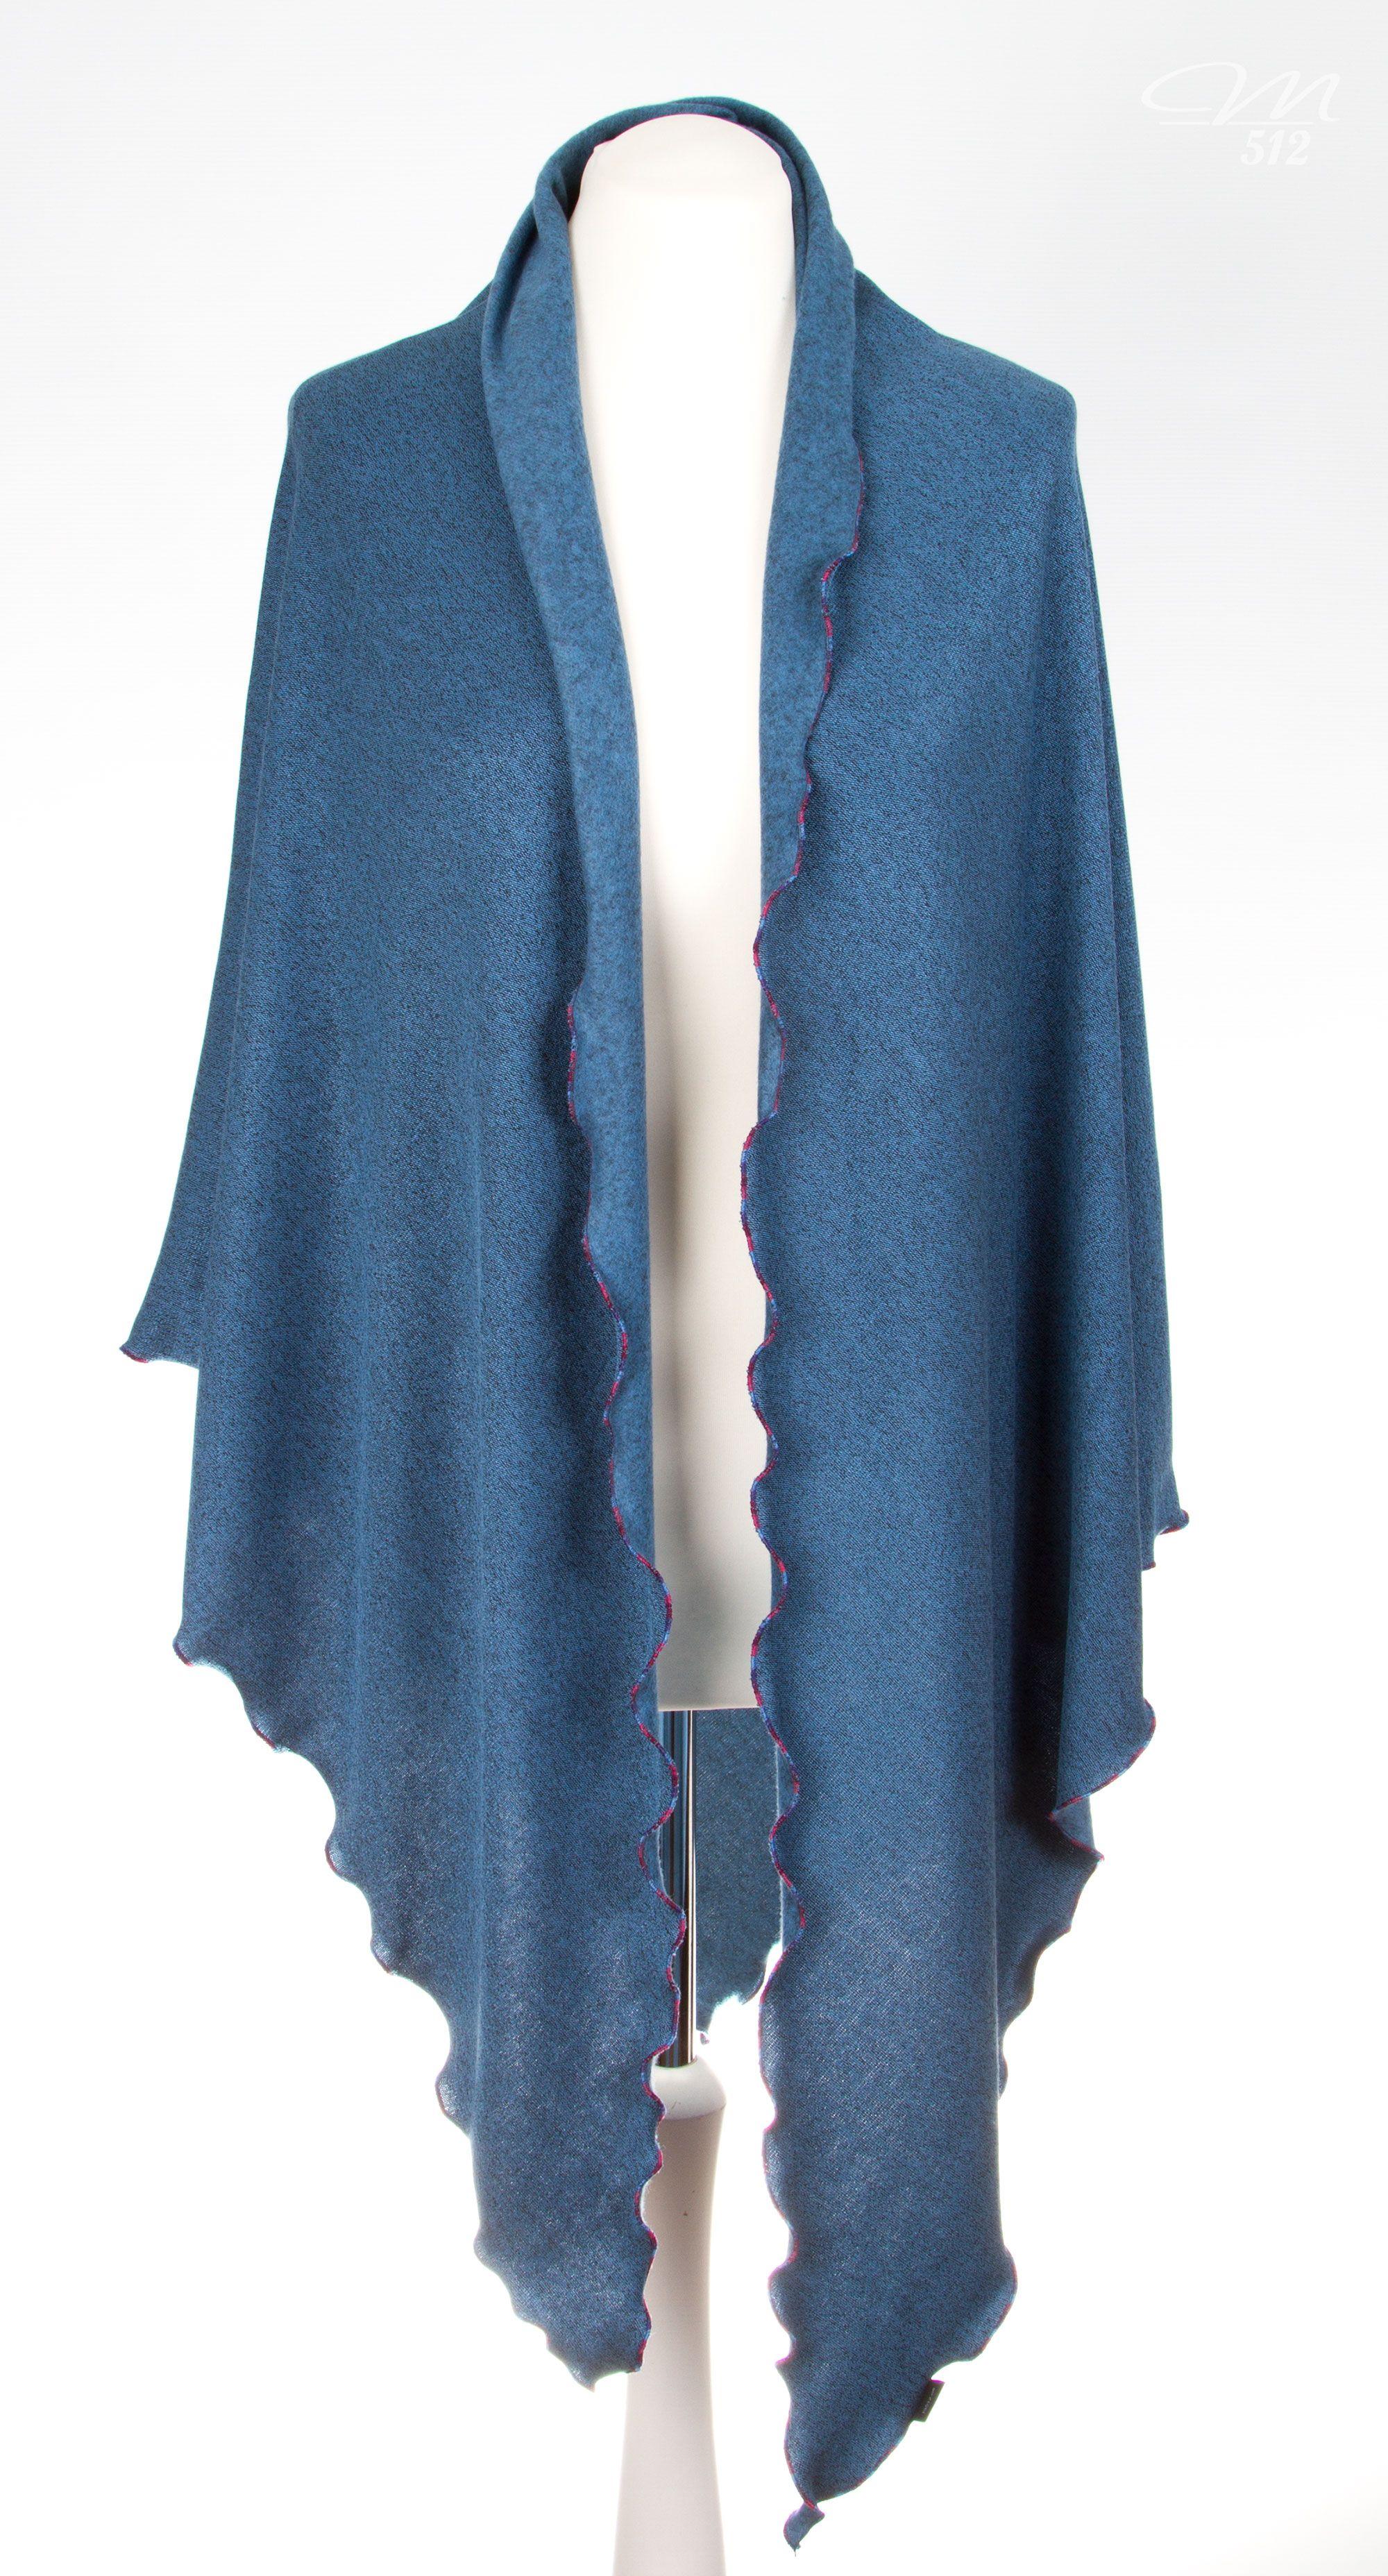 Strick-3Eck Jeans Rot-Blau - Manufaktur 512 - Einzigartige #Accessoires in #Handarbeit. +++ #Strick-3Eck #fashion #handmade #manufaktur